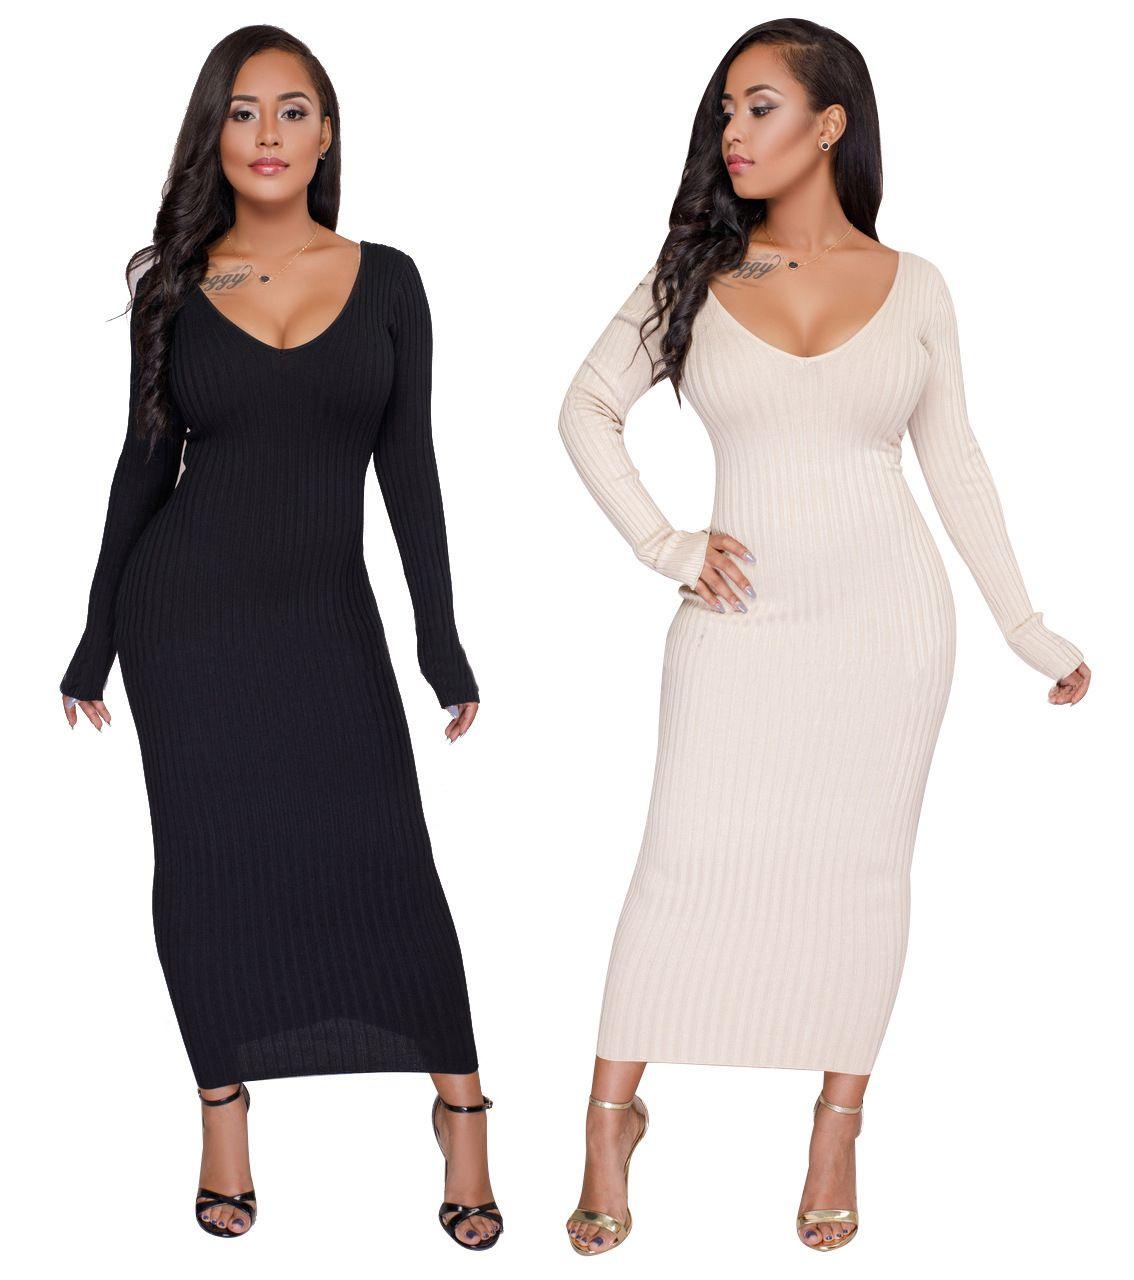 Xl 2019 Ladies Fashion Standard Code Hot Pin Sexy Two Wear Breast